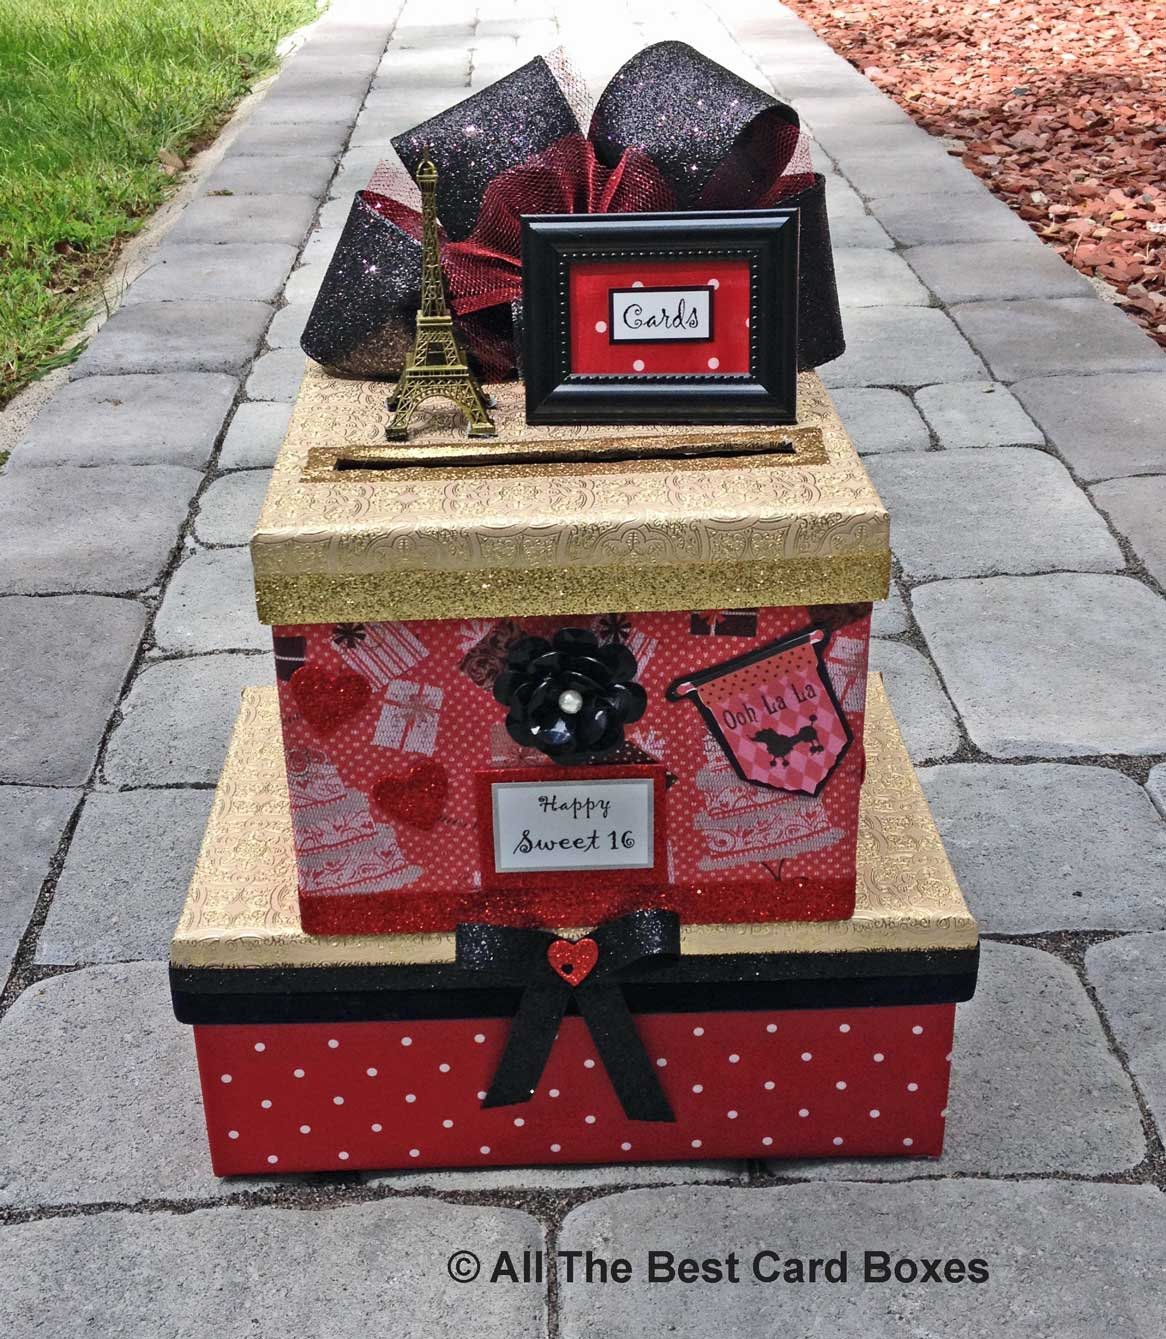 Sweet 16 Card Box,Sweet 16 Invitation,Paris theme party,Paris Invitation,Quinceanera,Card Box,Eiffel Tower,eiffel tower cake topper,red #sweet16cakes